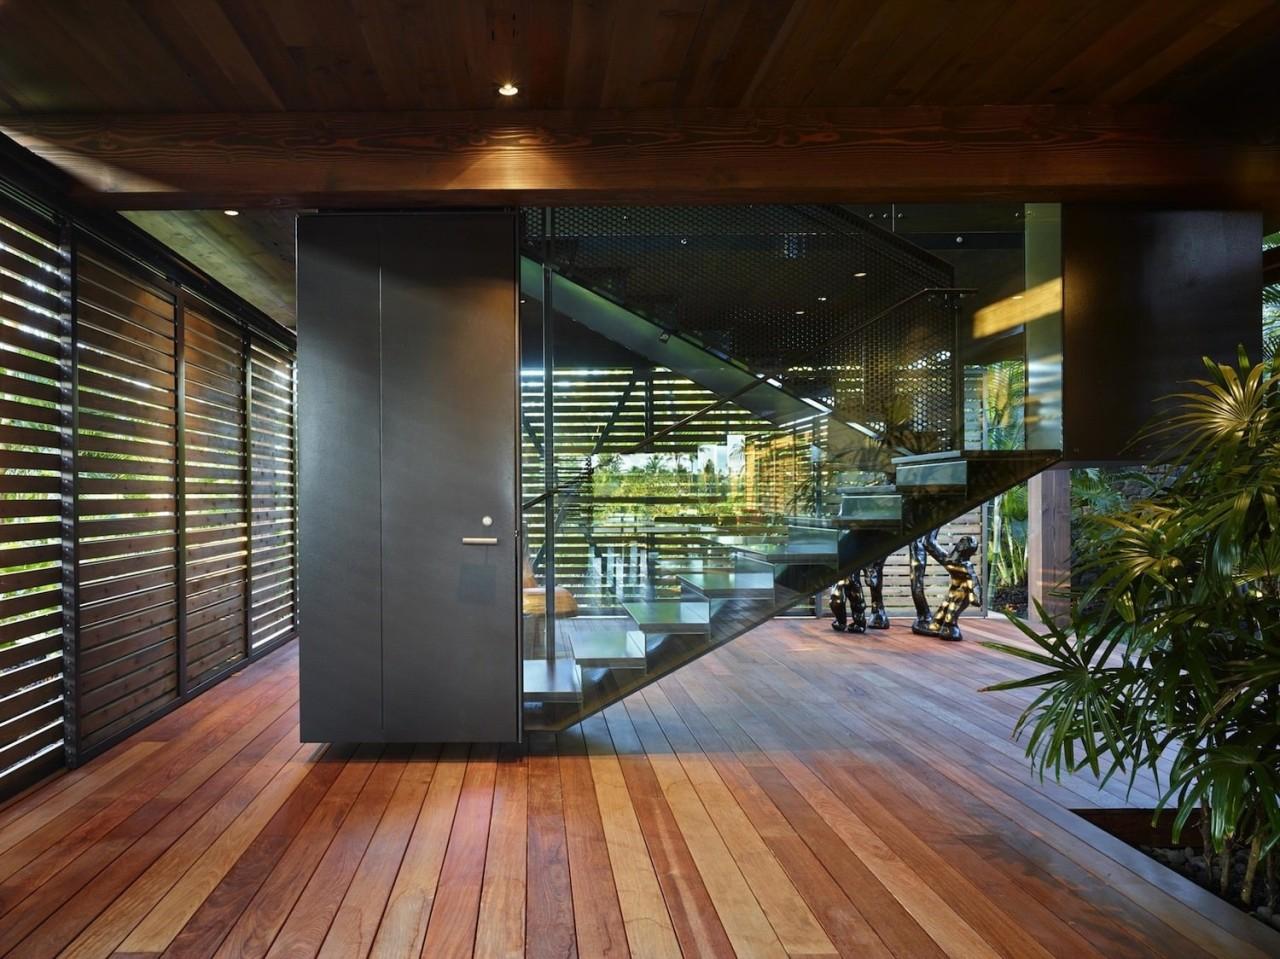 Architect: Olson KundigPhotography by Benjamin Benschneider architecture, condominium, daylighting, estate, home, house, interior design, lobby, real estate, stairs, wood, black, brown